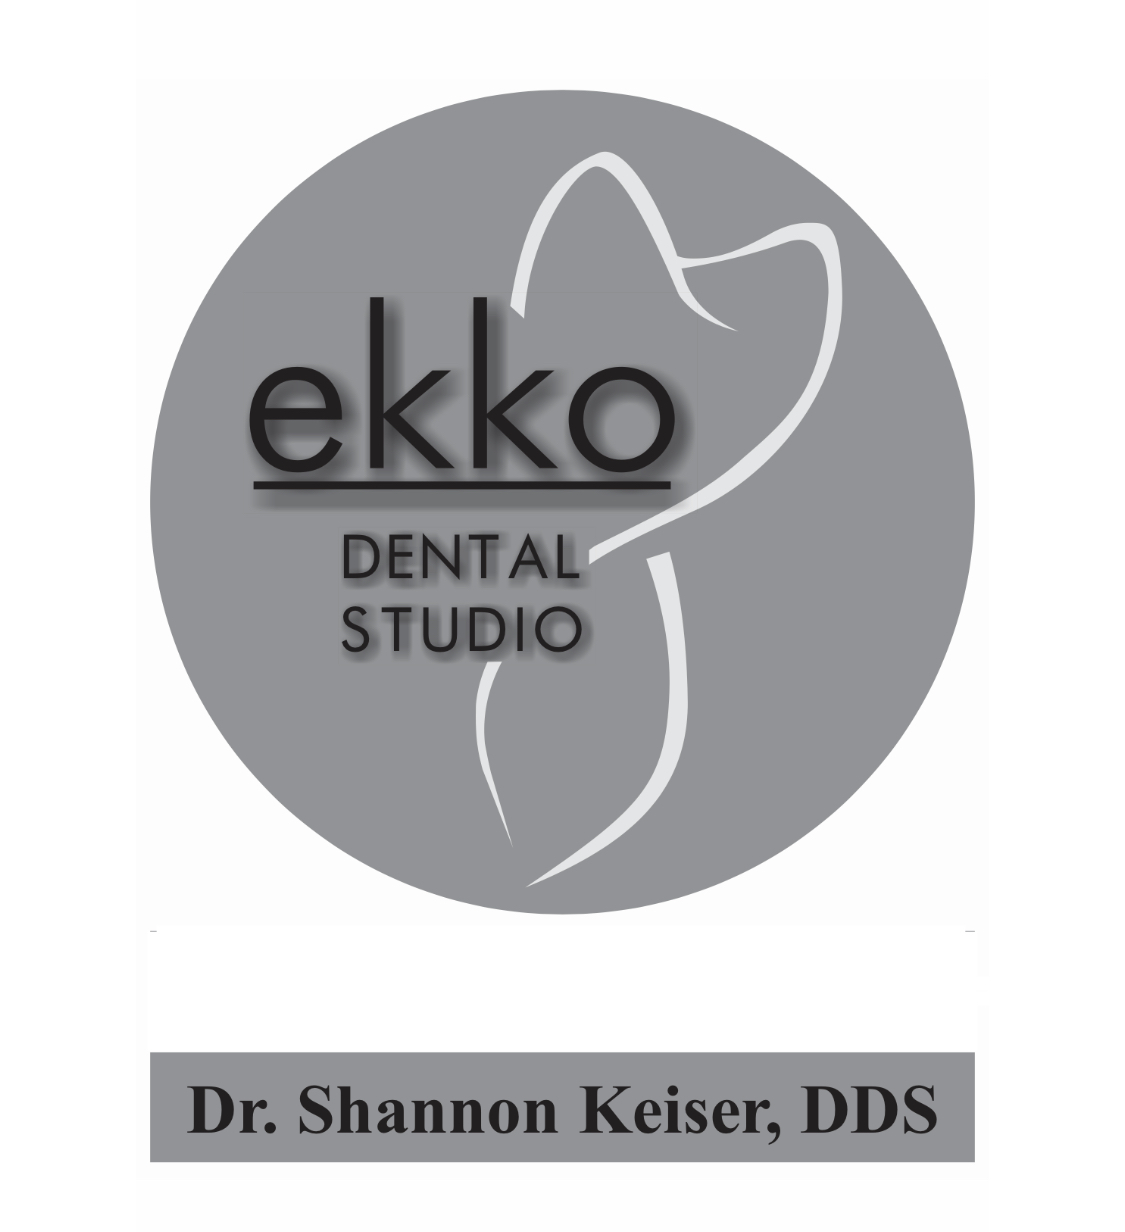 ekko DENTAL STUDIO logo